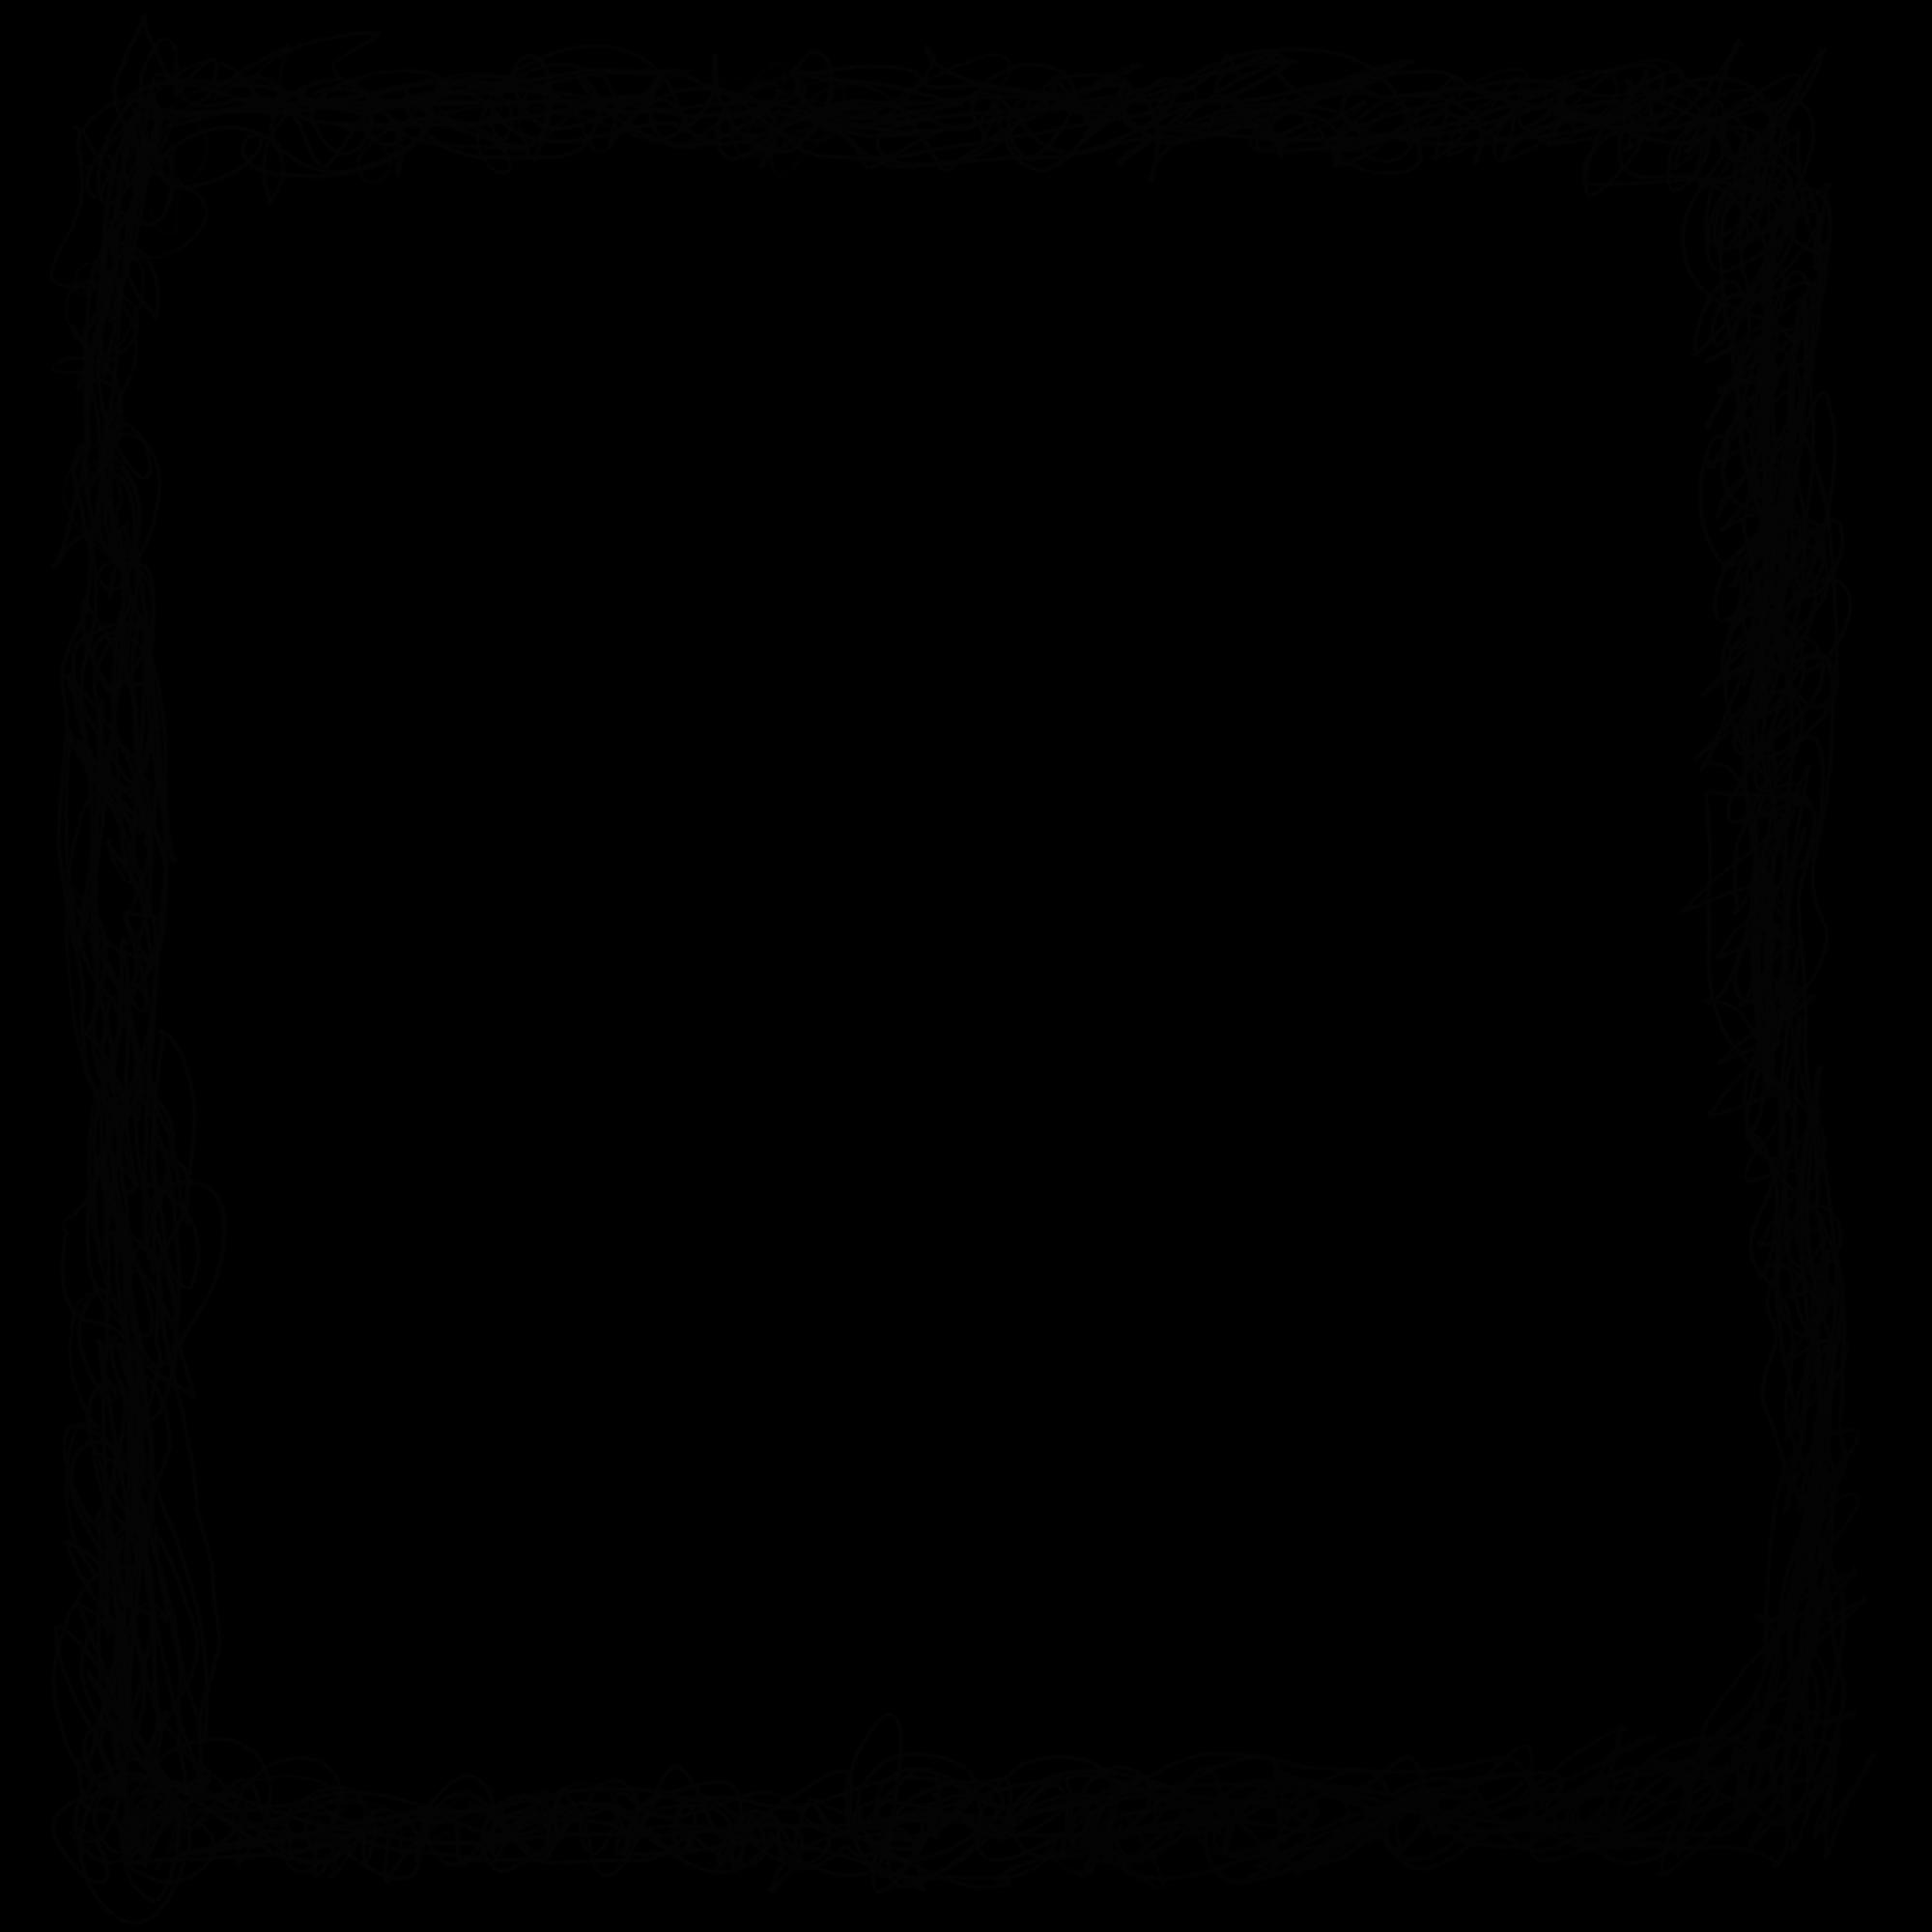 4 Square Scribble Frame (PNG Transparent) | OnlyGFX.com